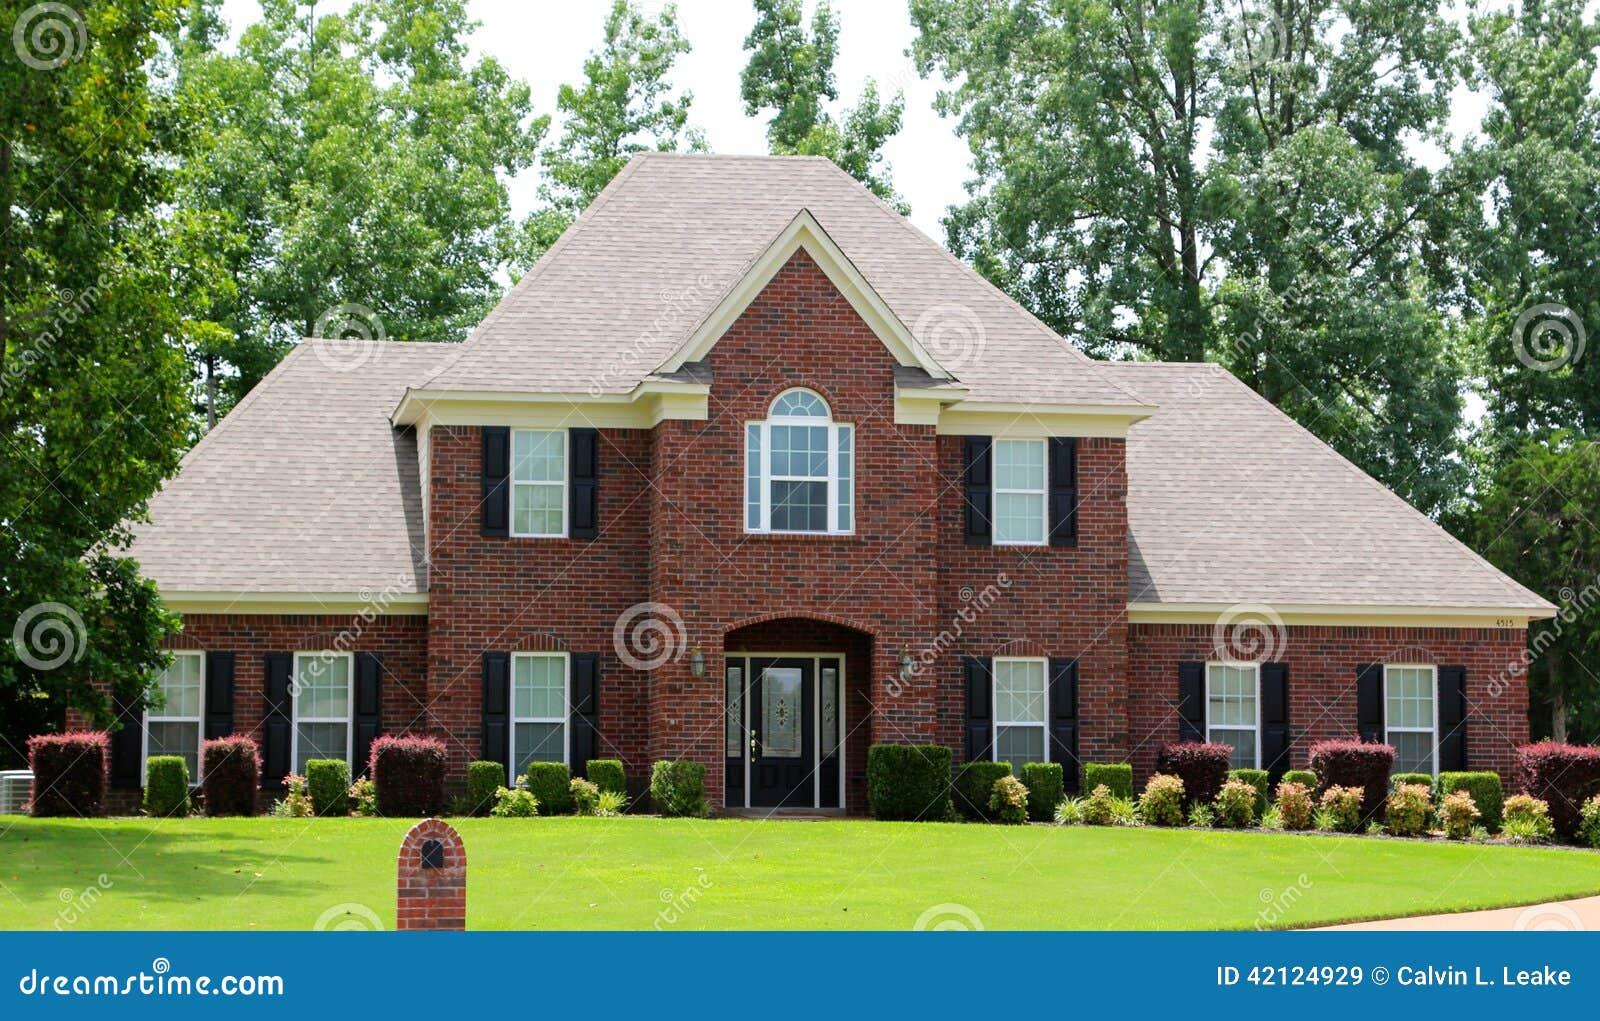 Elegant Red Brick Middle Class Suburban Home Stock Photo ...